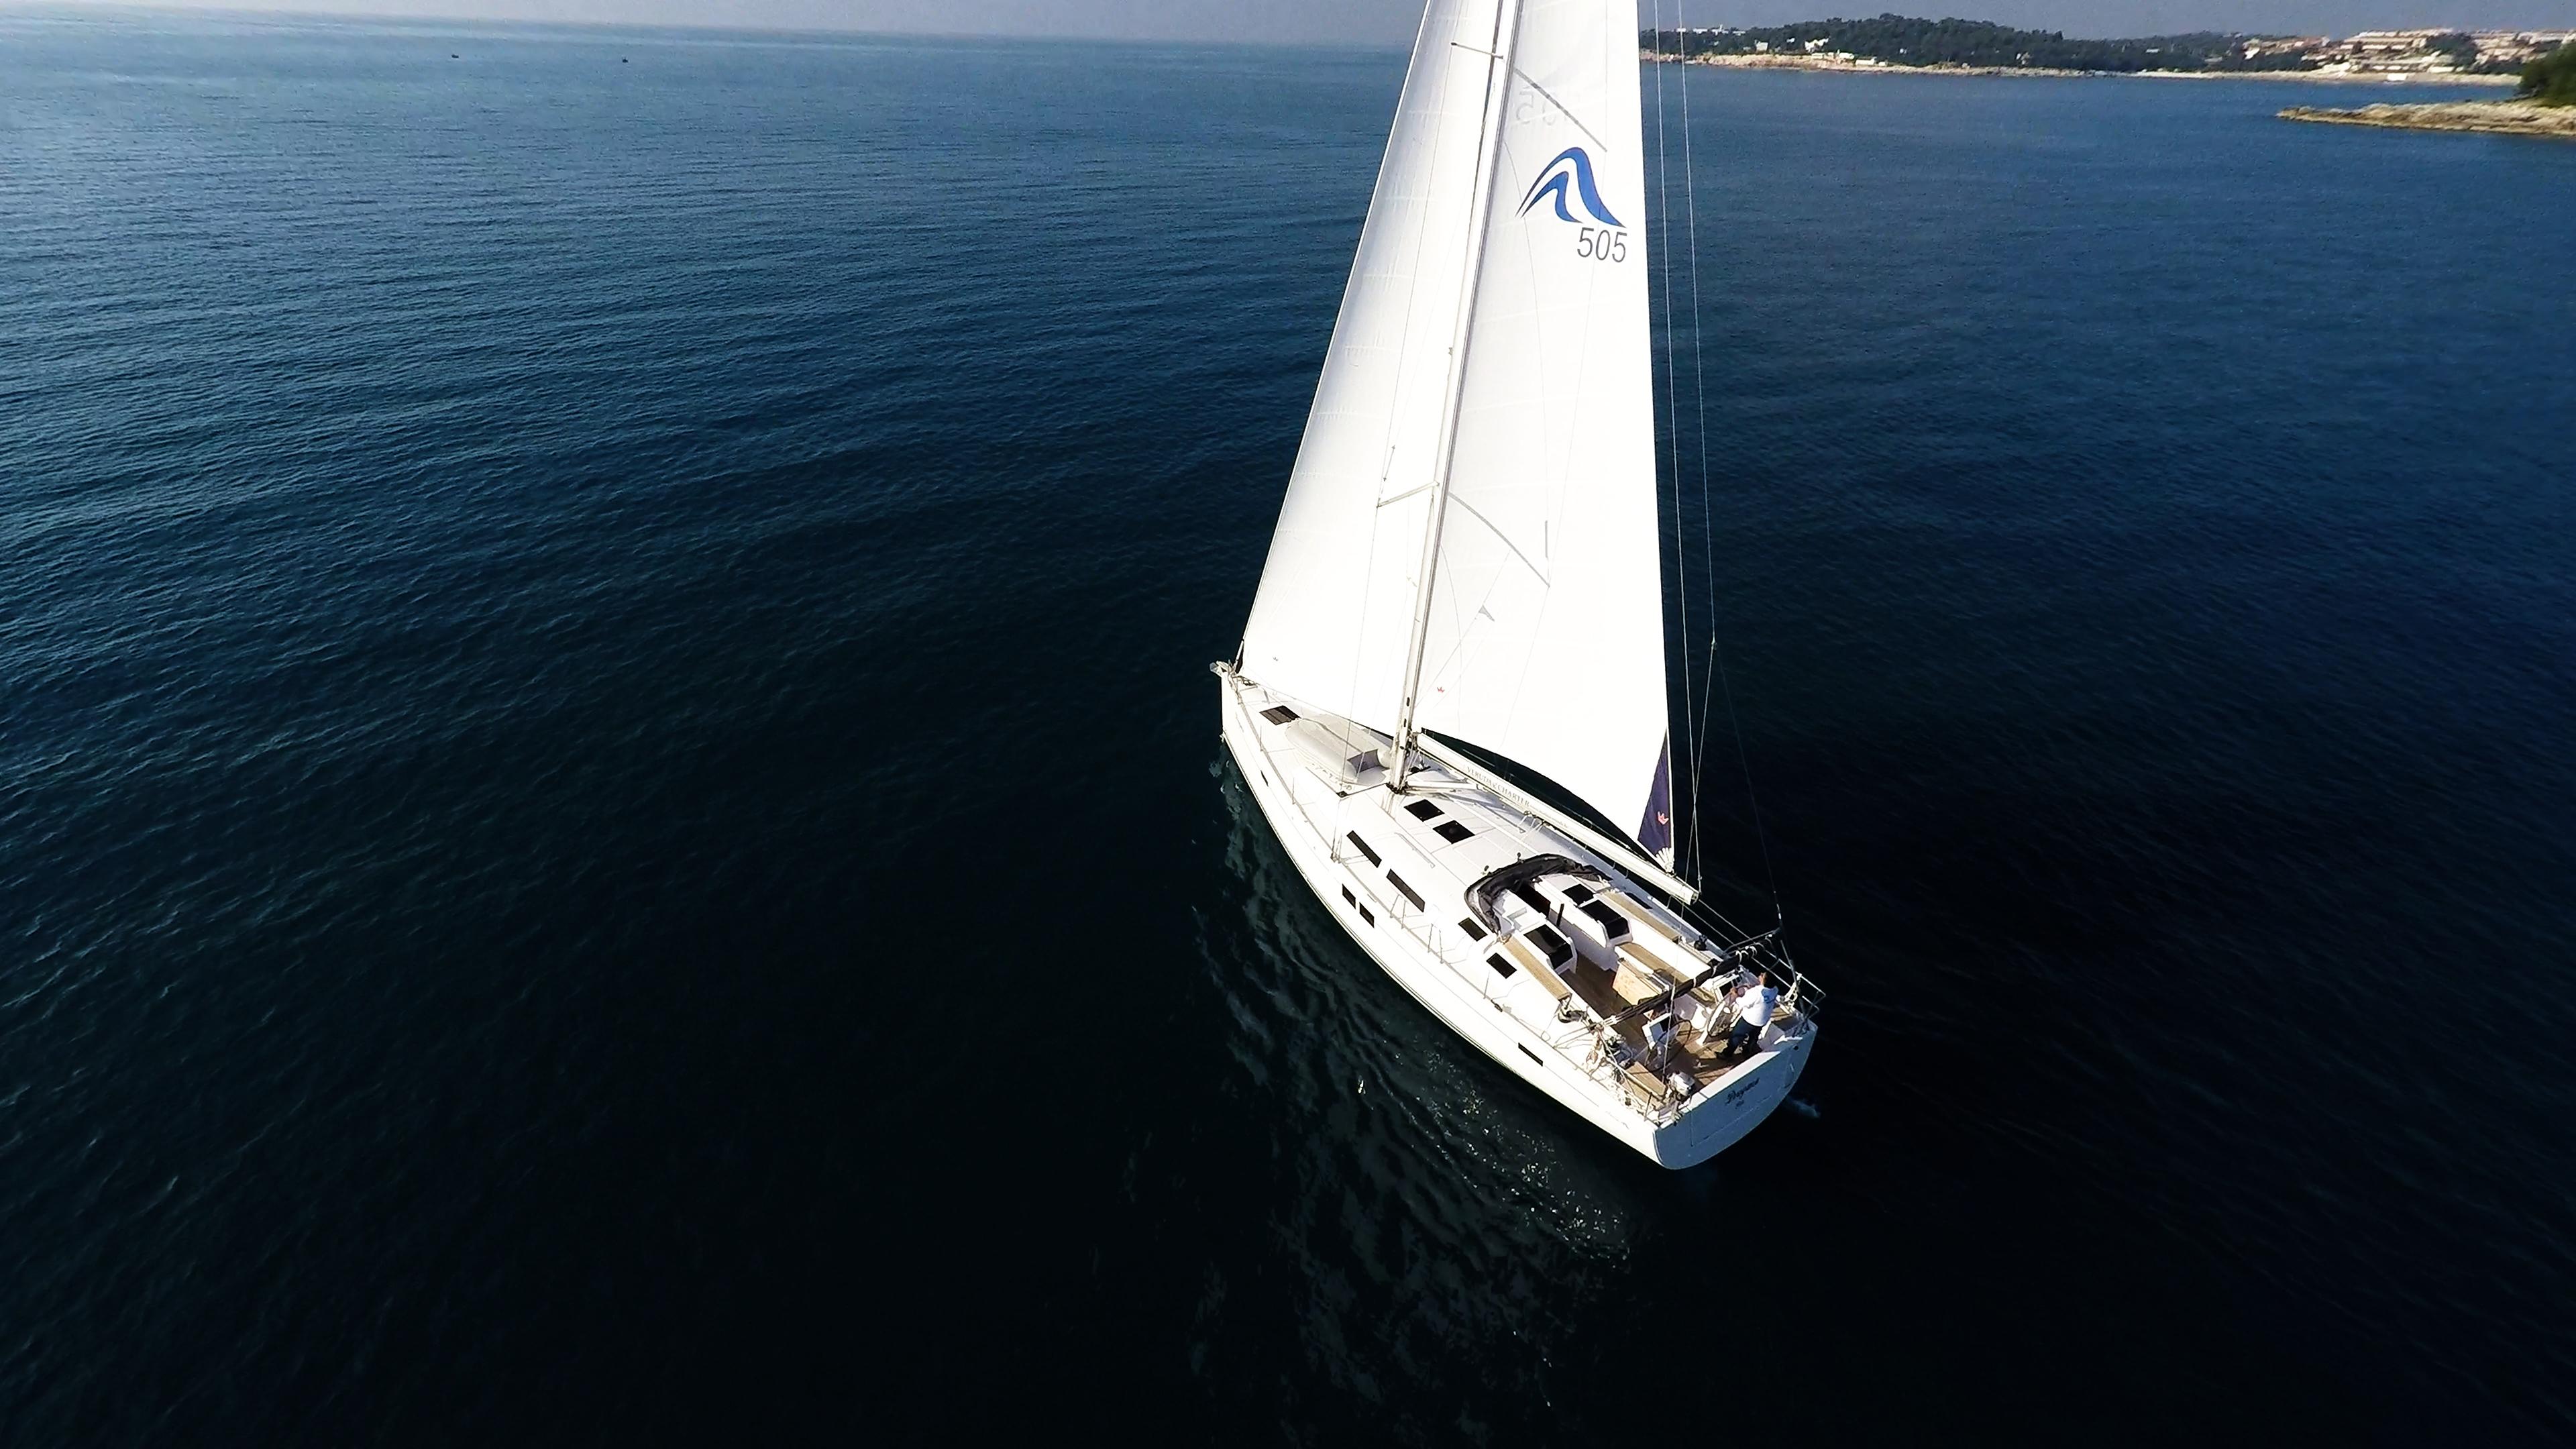 barcha a vela barca a vela Hanse 505 veleggiare mare